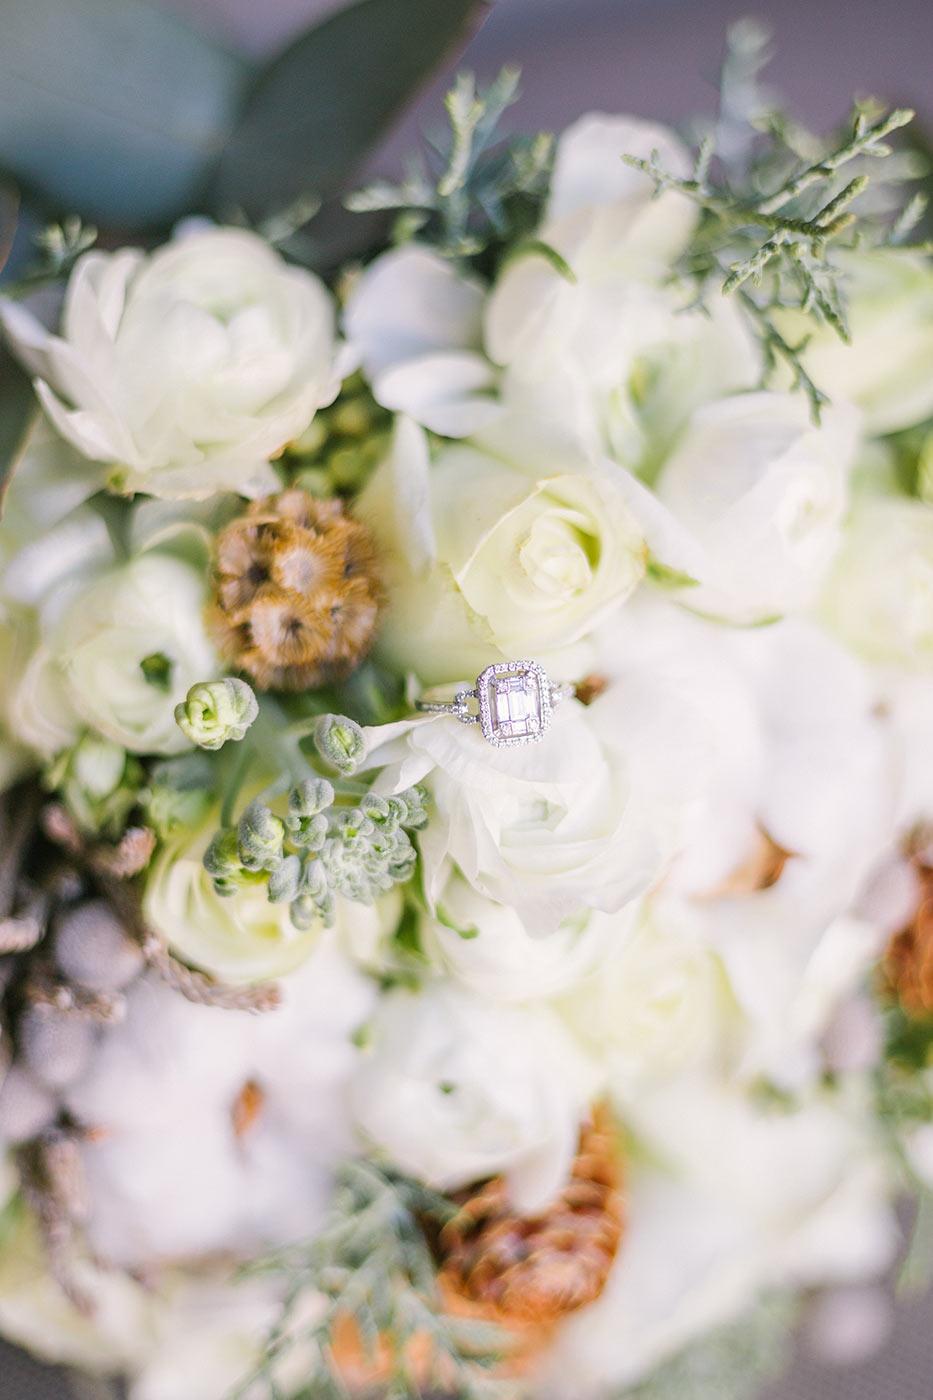 Lovely Wedding flowers | Fine Art Photographer | Lena Karelova Photography | Destination Wedding Photographer Barcelona |Film Wedding Photographer